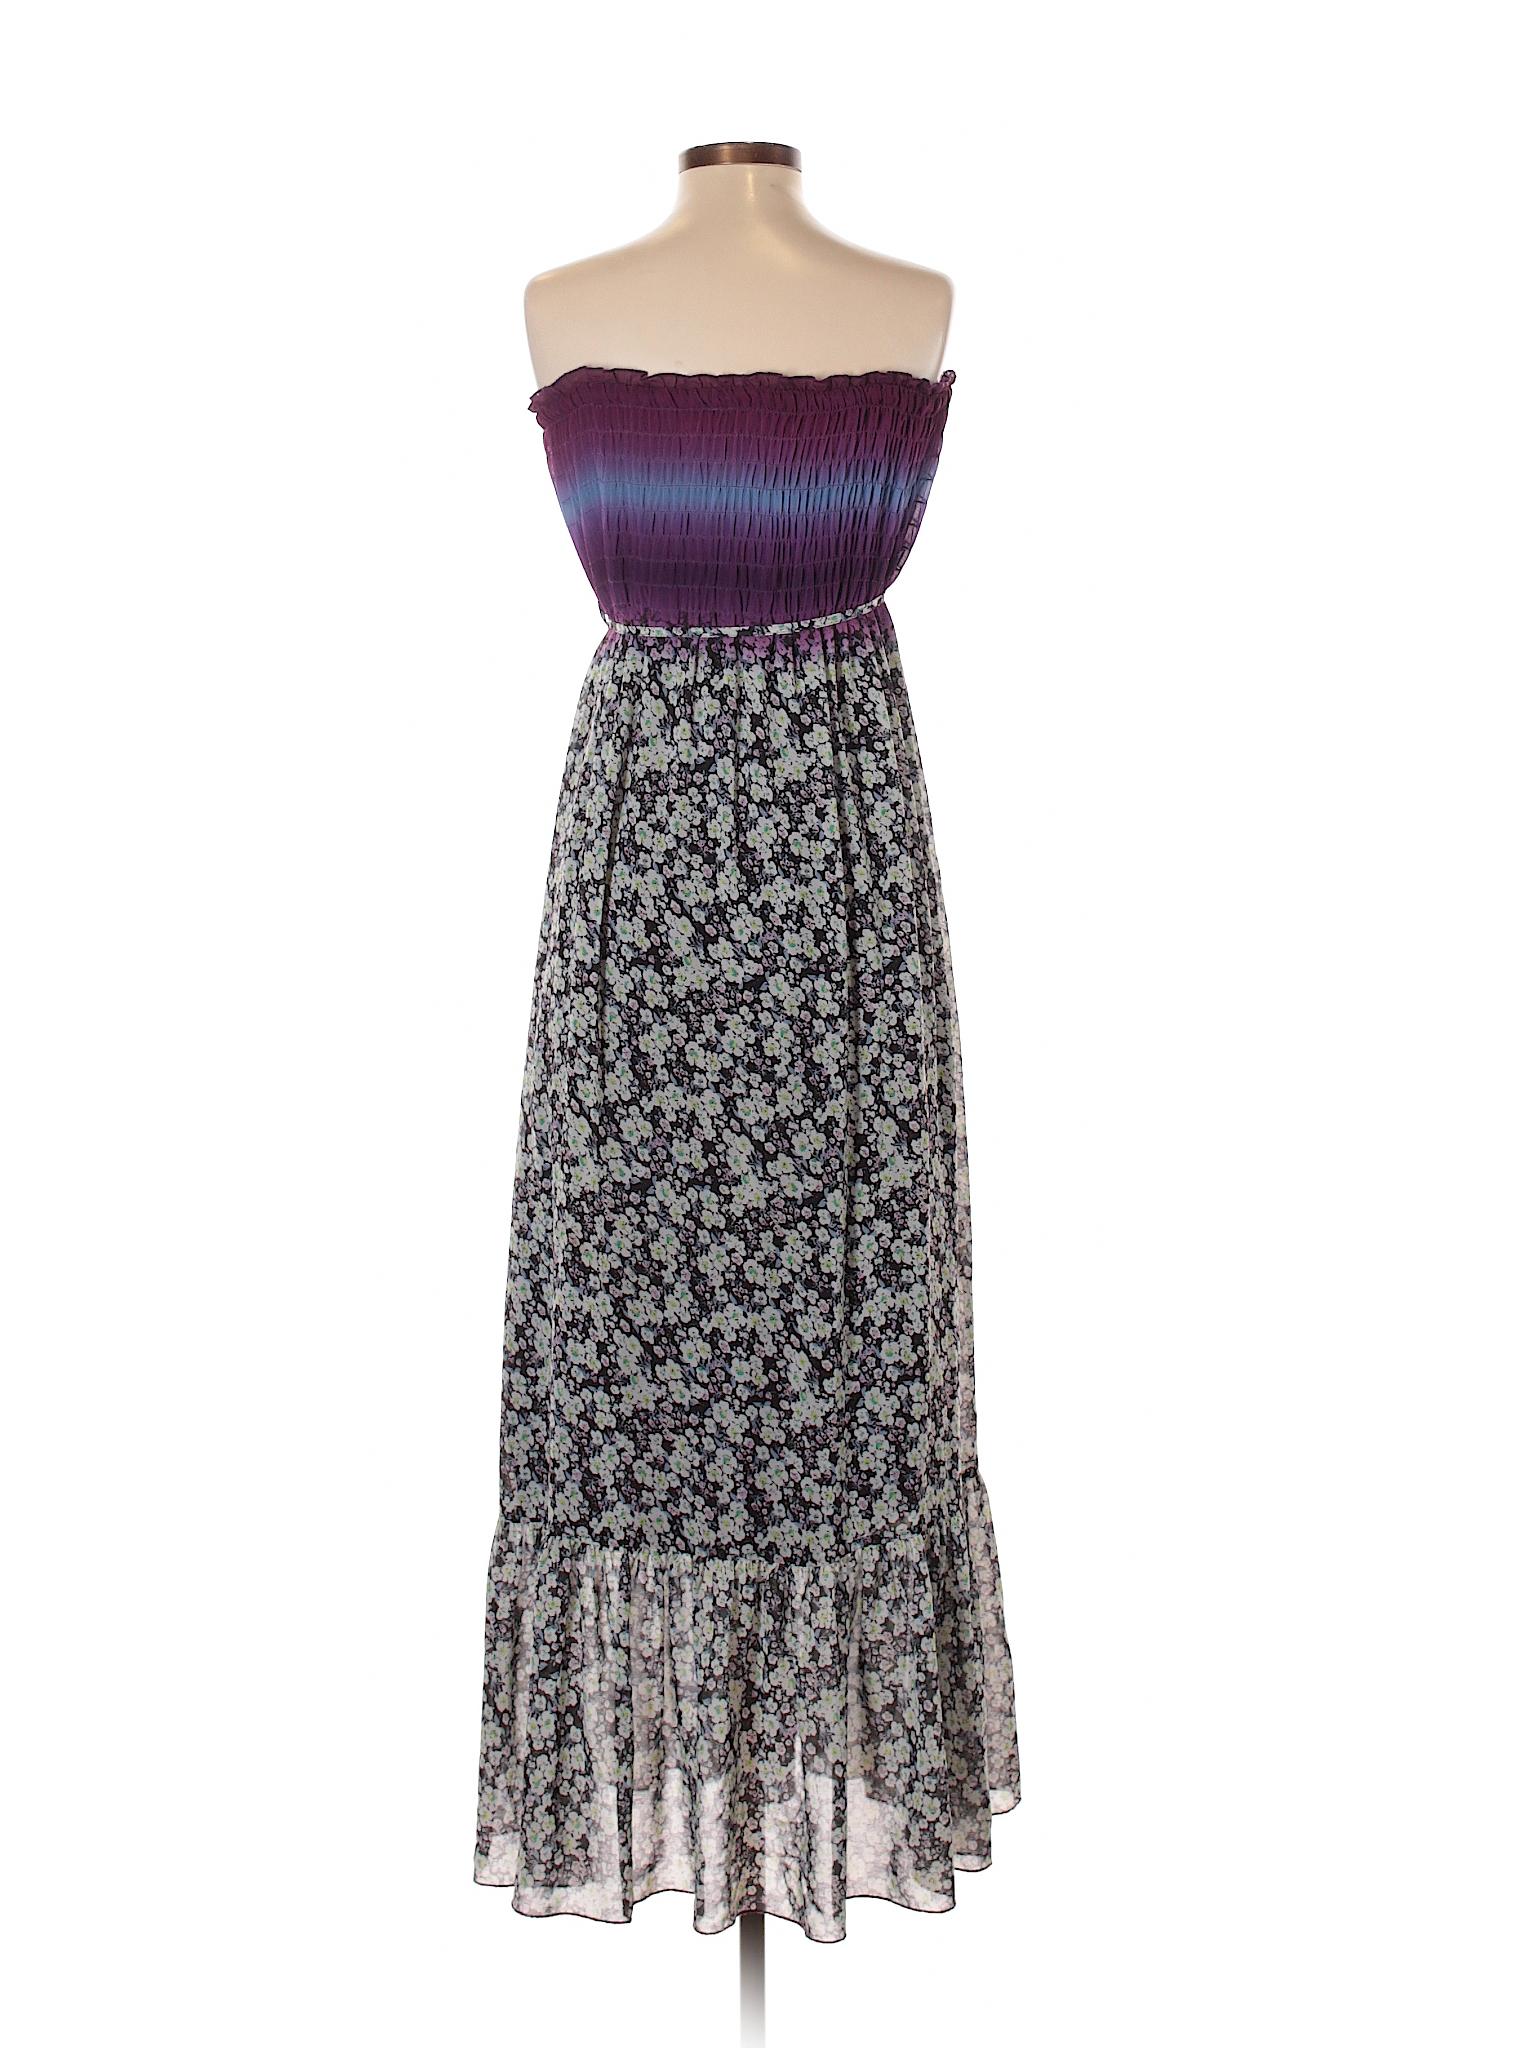 winter winter Dex Dress Casual winter Boutique Dress Boutique Boutique Dress Dex winter Casual Dex Boutique Casual wwg07Aqt